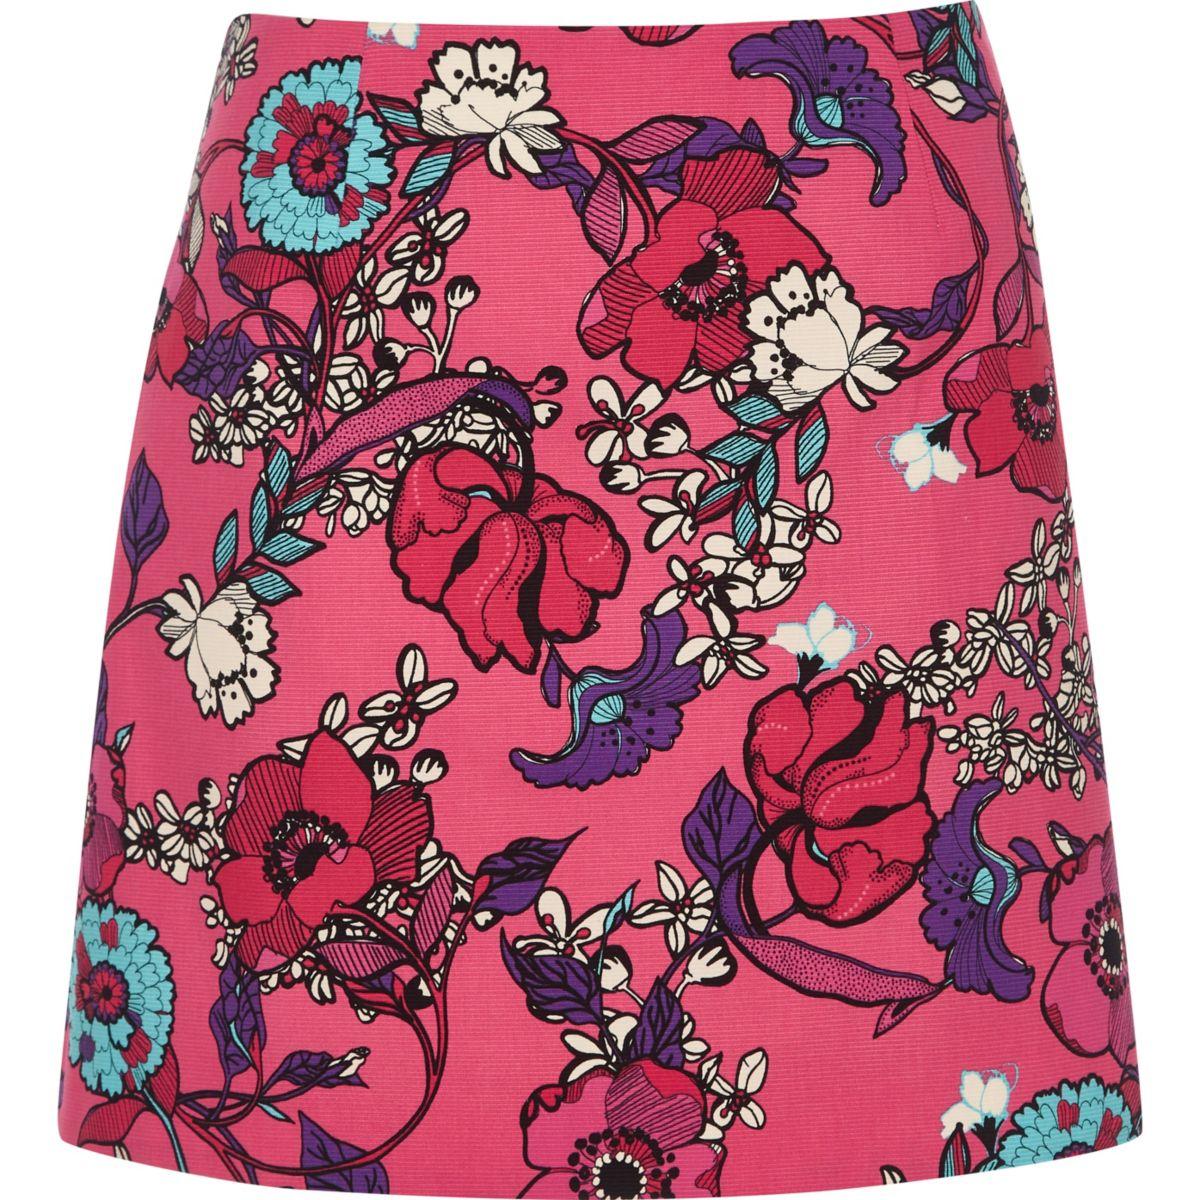 Pink floral print mini skirt